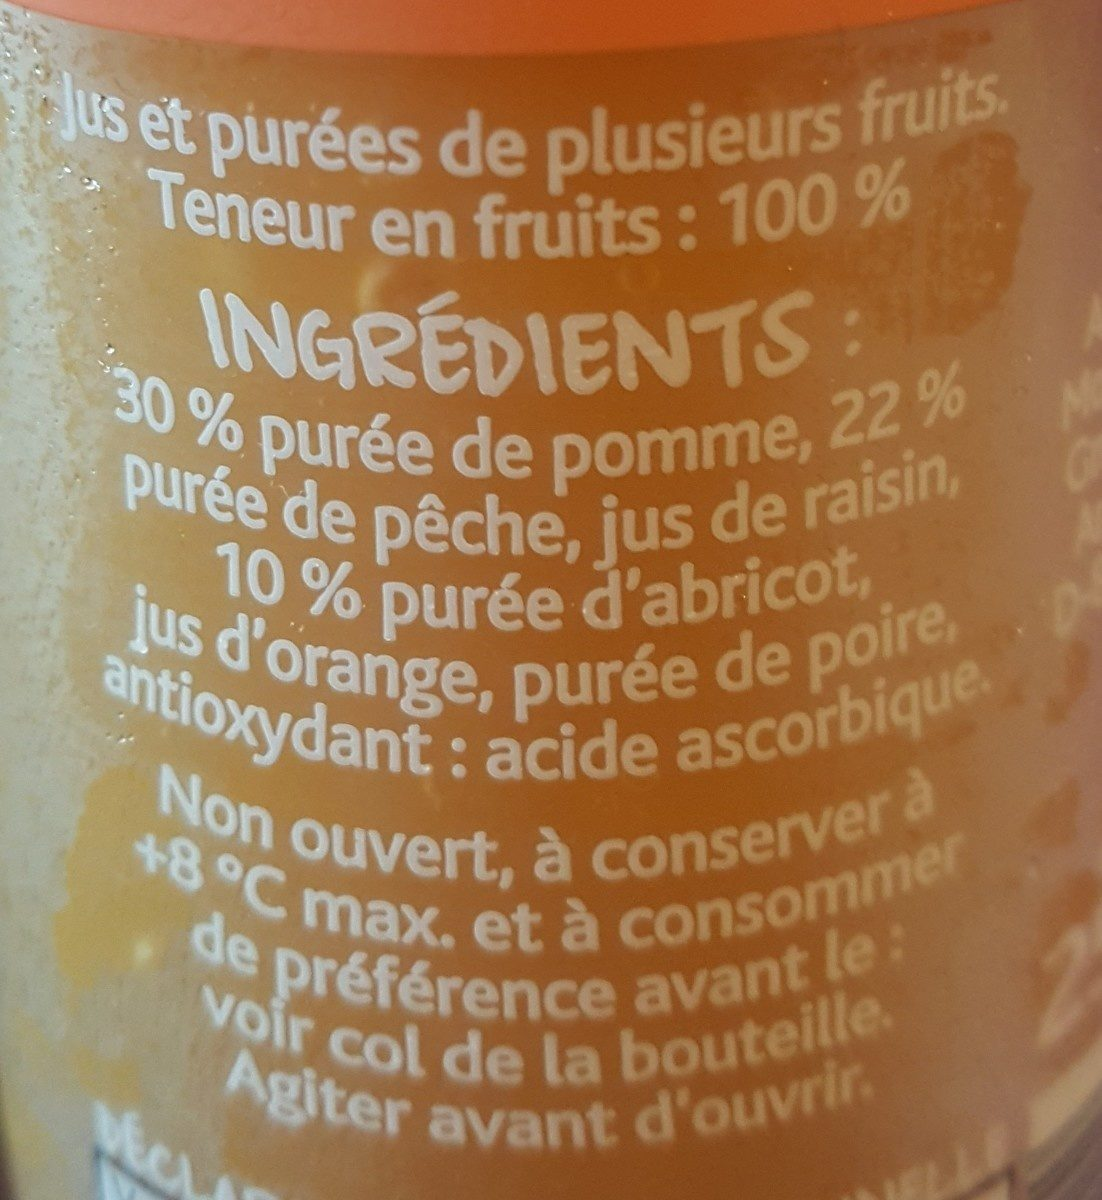 Smoothie pomme, pêche, abricot - Ingrediënten - fr